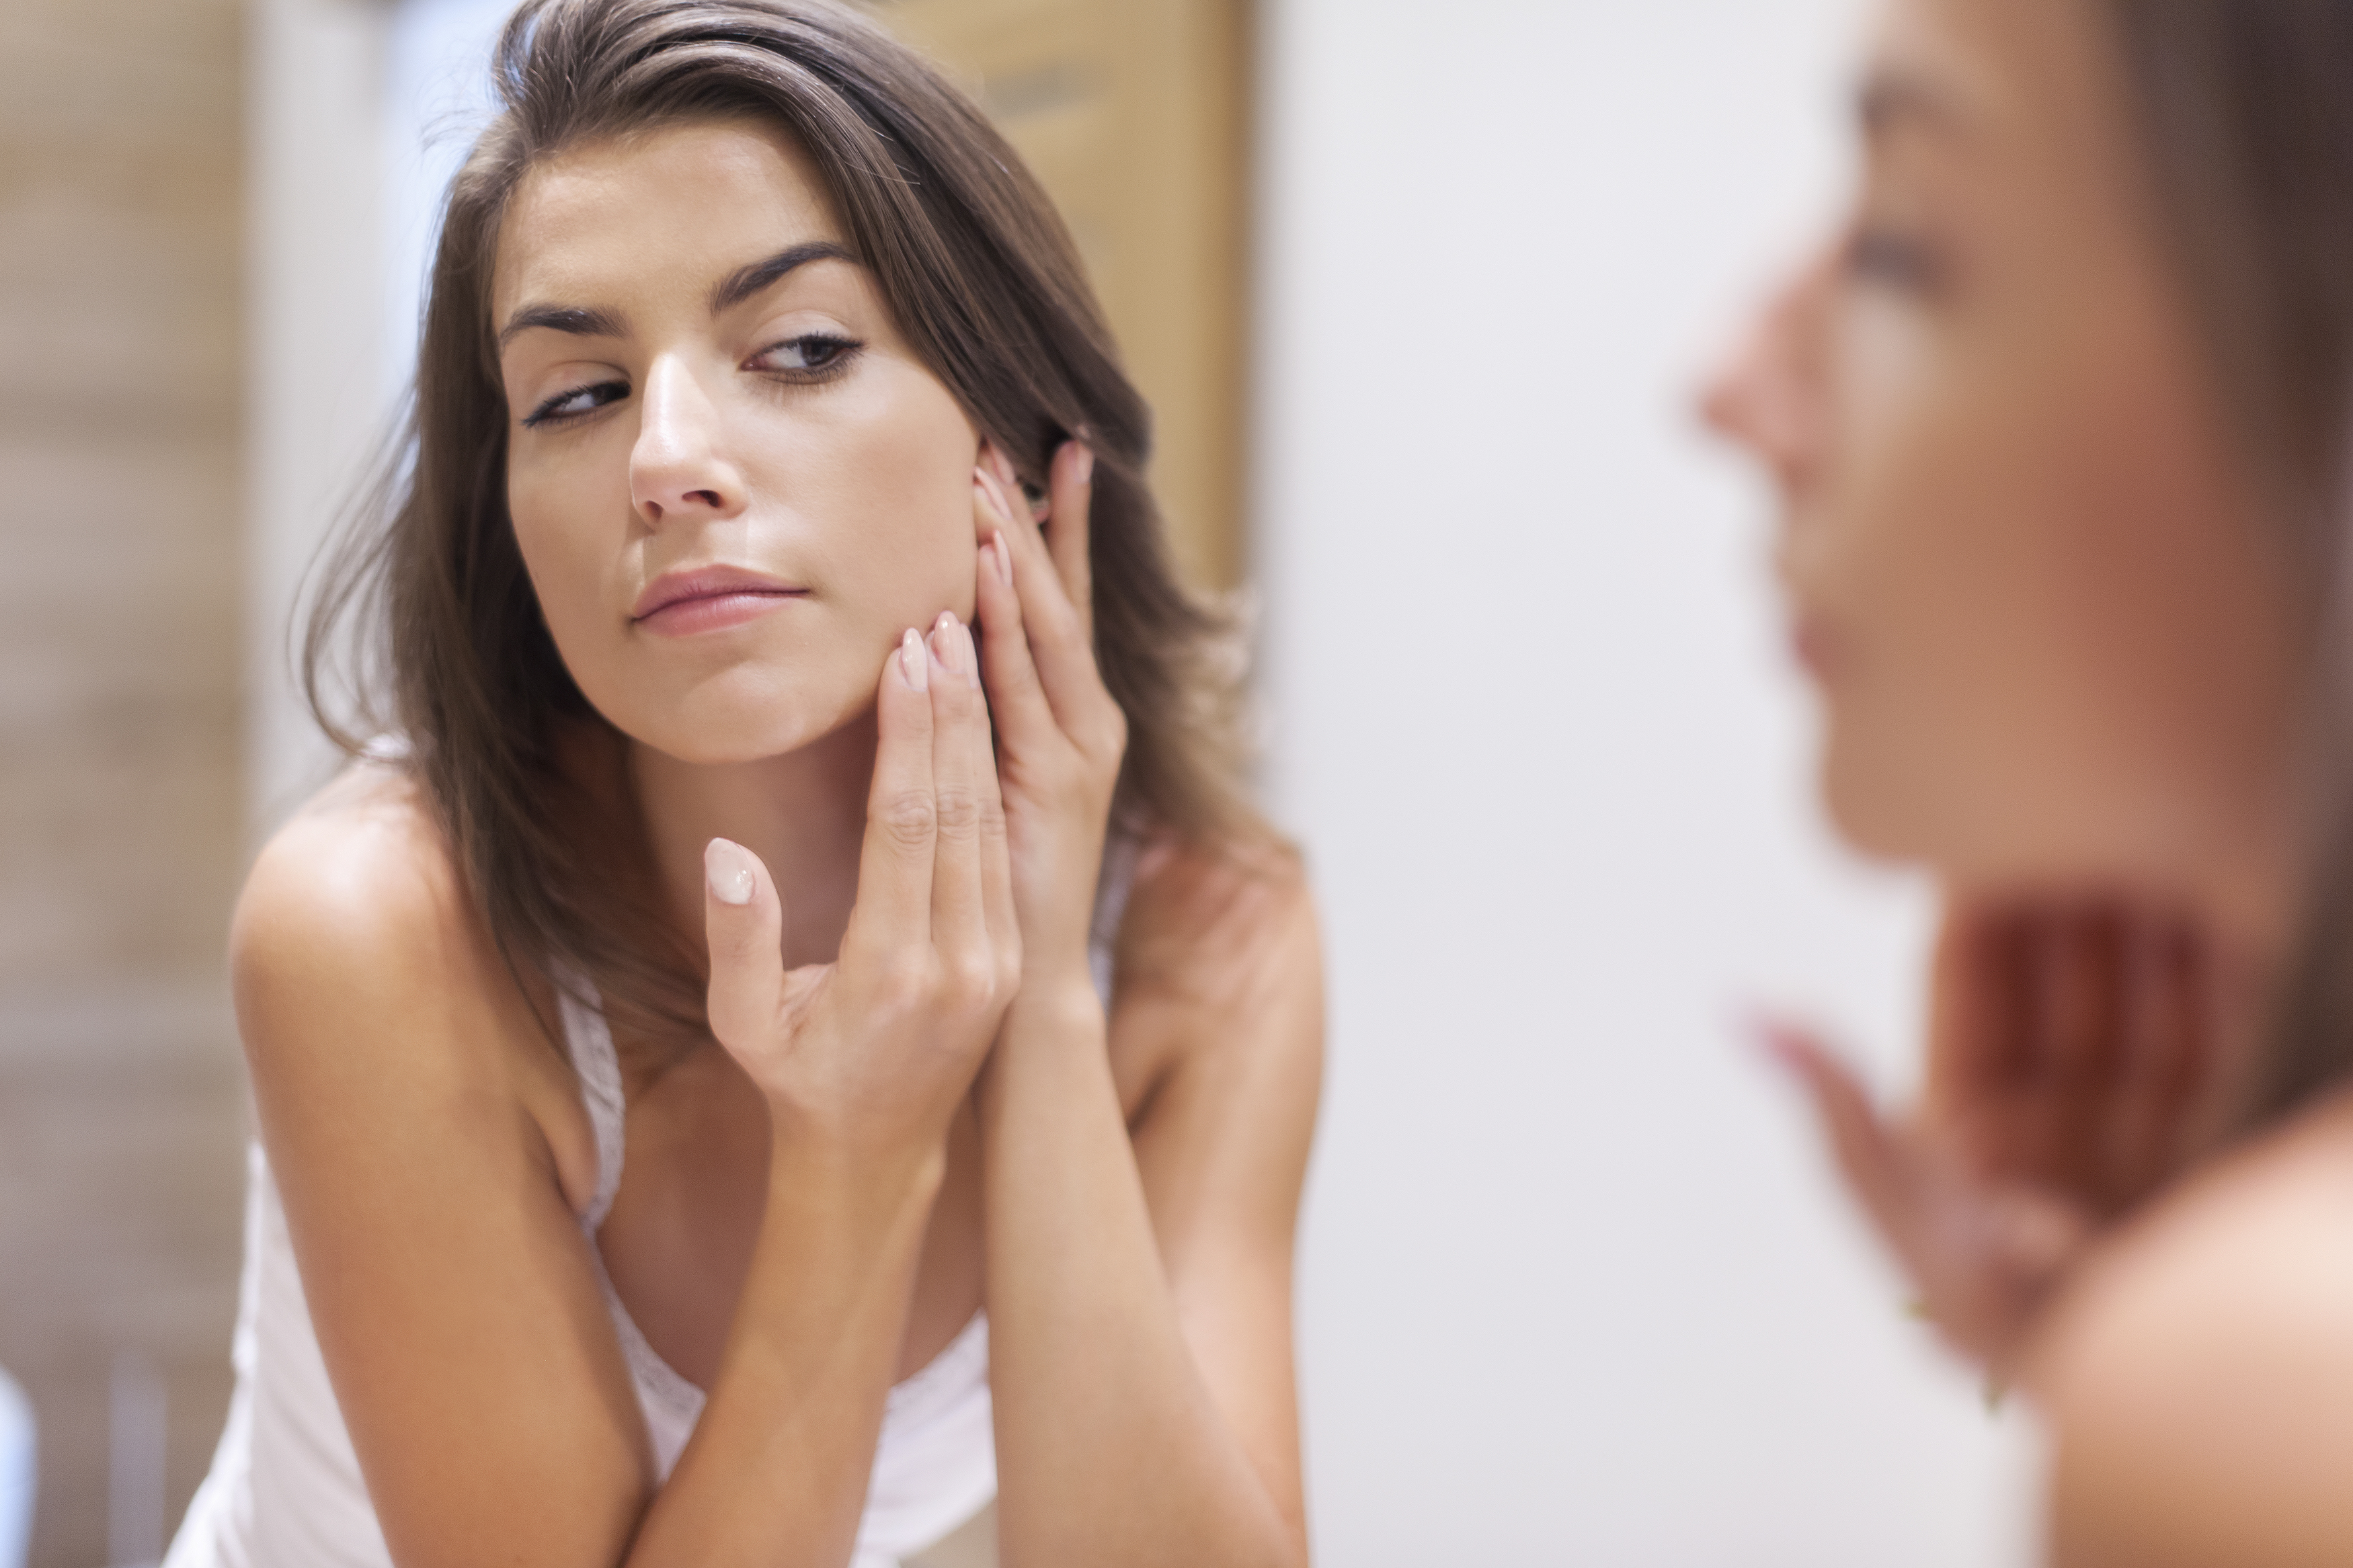 How to Best Treat an Underground Pimple